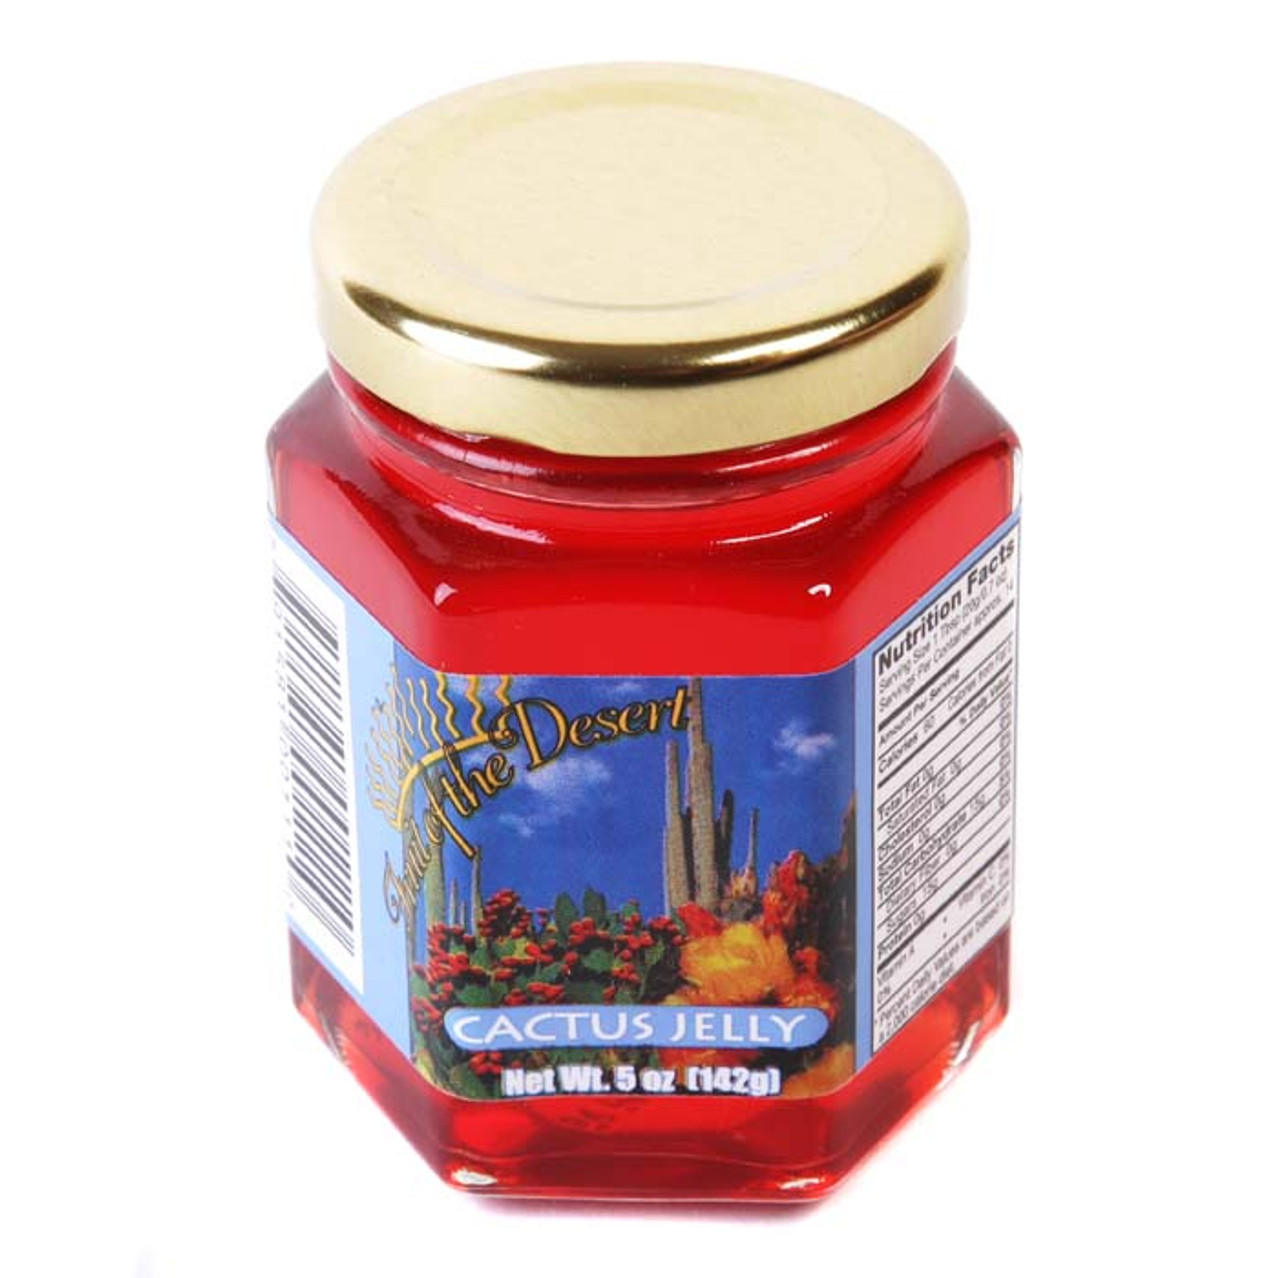 Gourmet Cactus Jelly 5oz-Case of 12